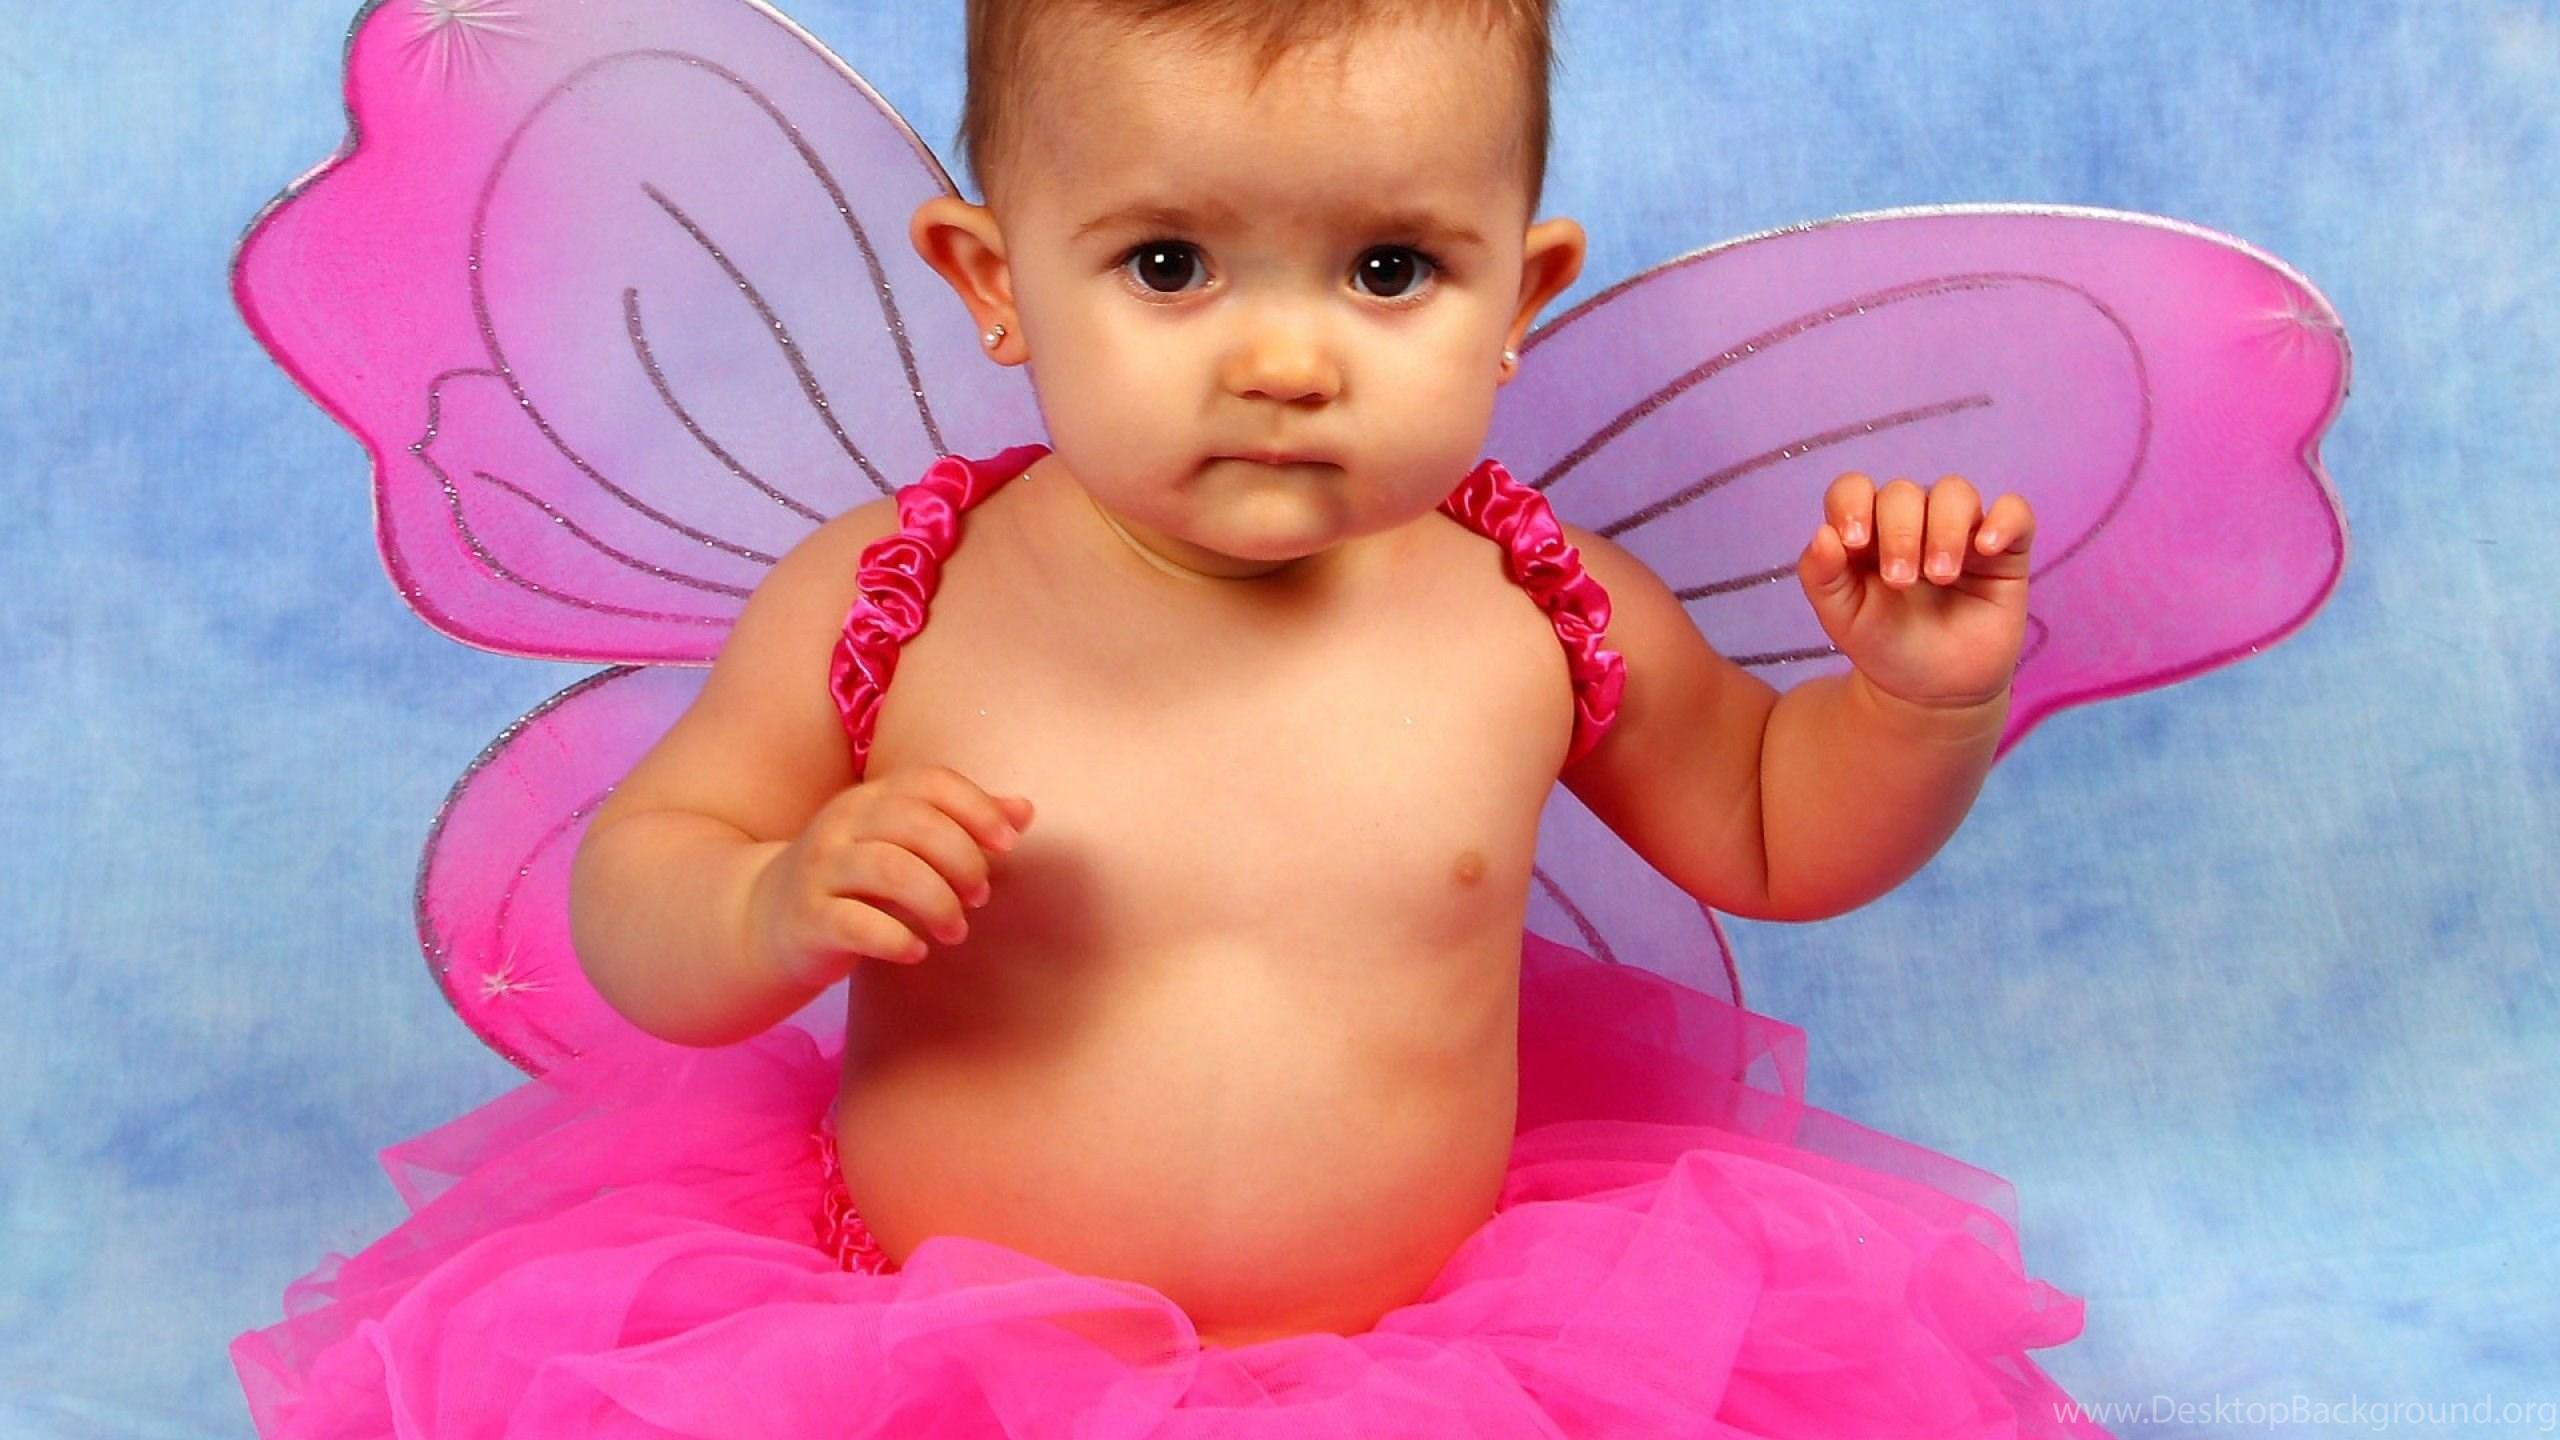 Cute Girl Babies Wallpapers For Facebook Profile 4 Desktop